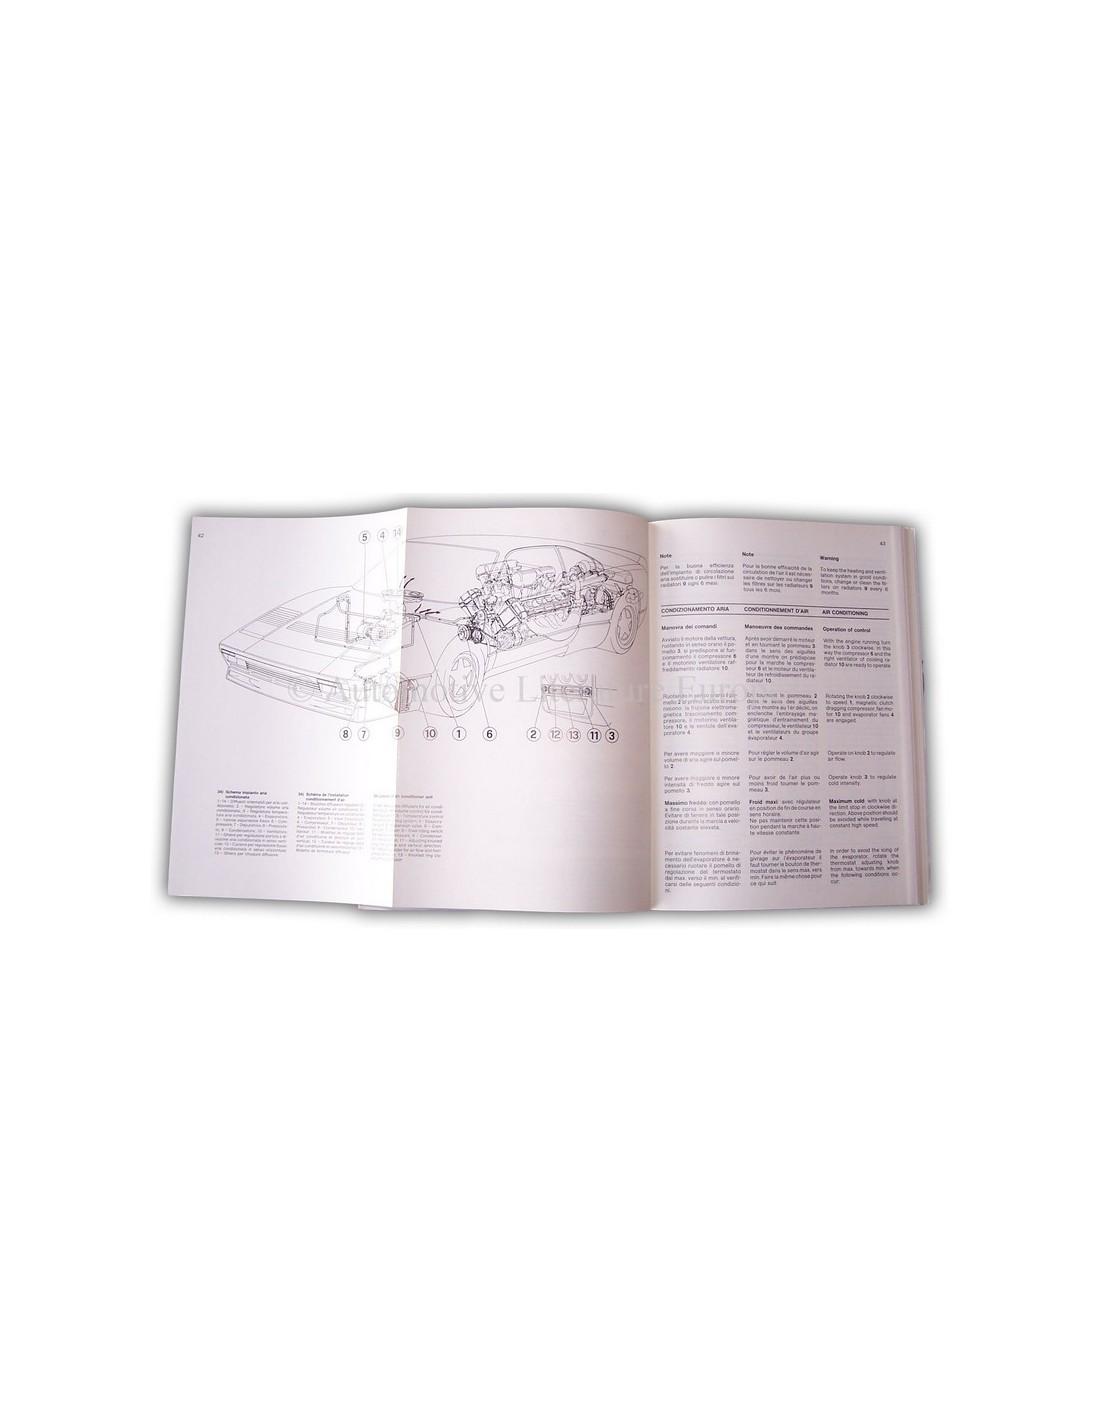 1985 ferrari 288 gto owners manual handbook 1985 ferrari 288 gto instructieboekje sciox Image collections